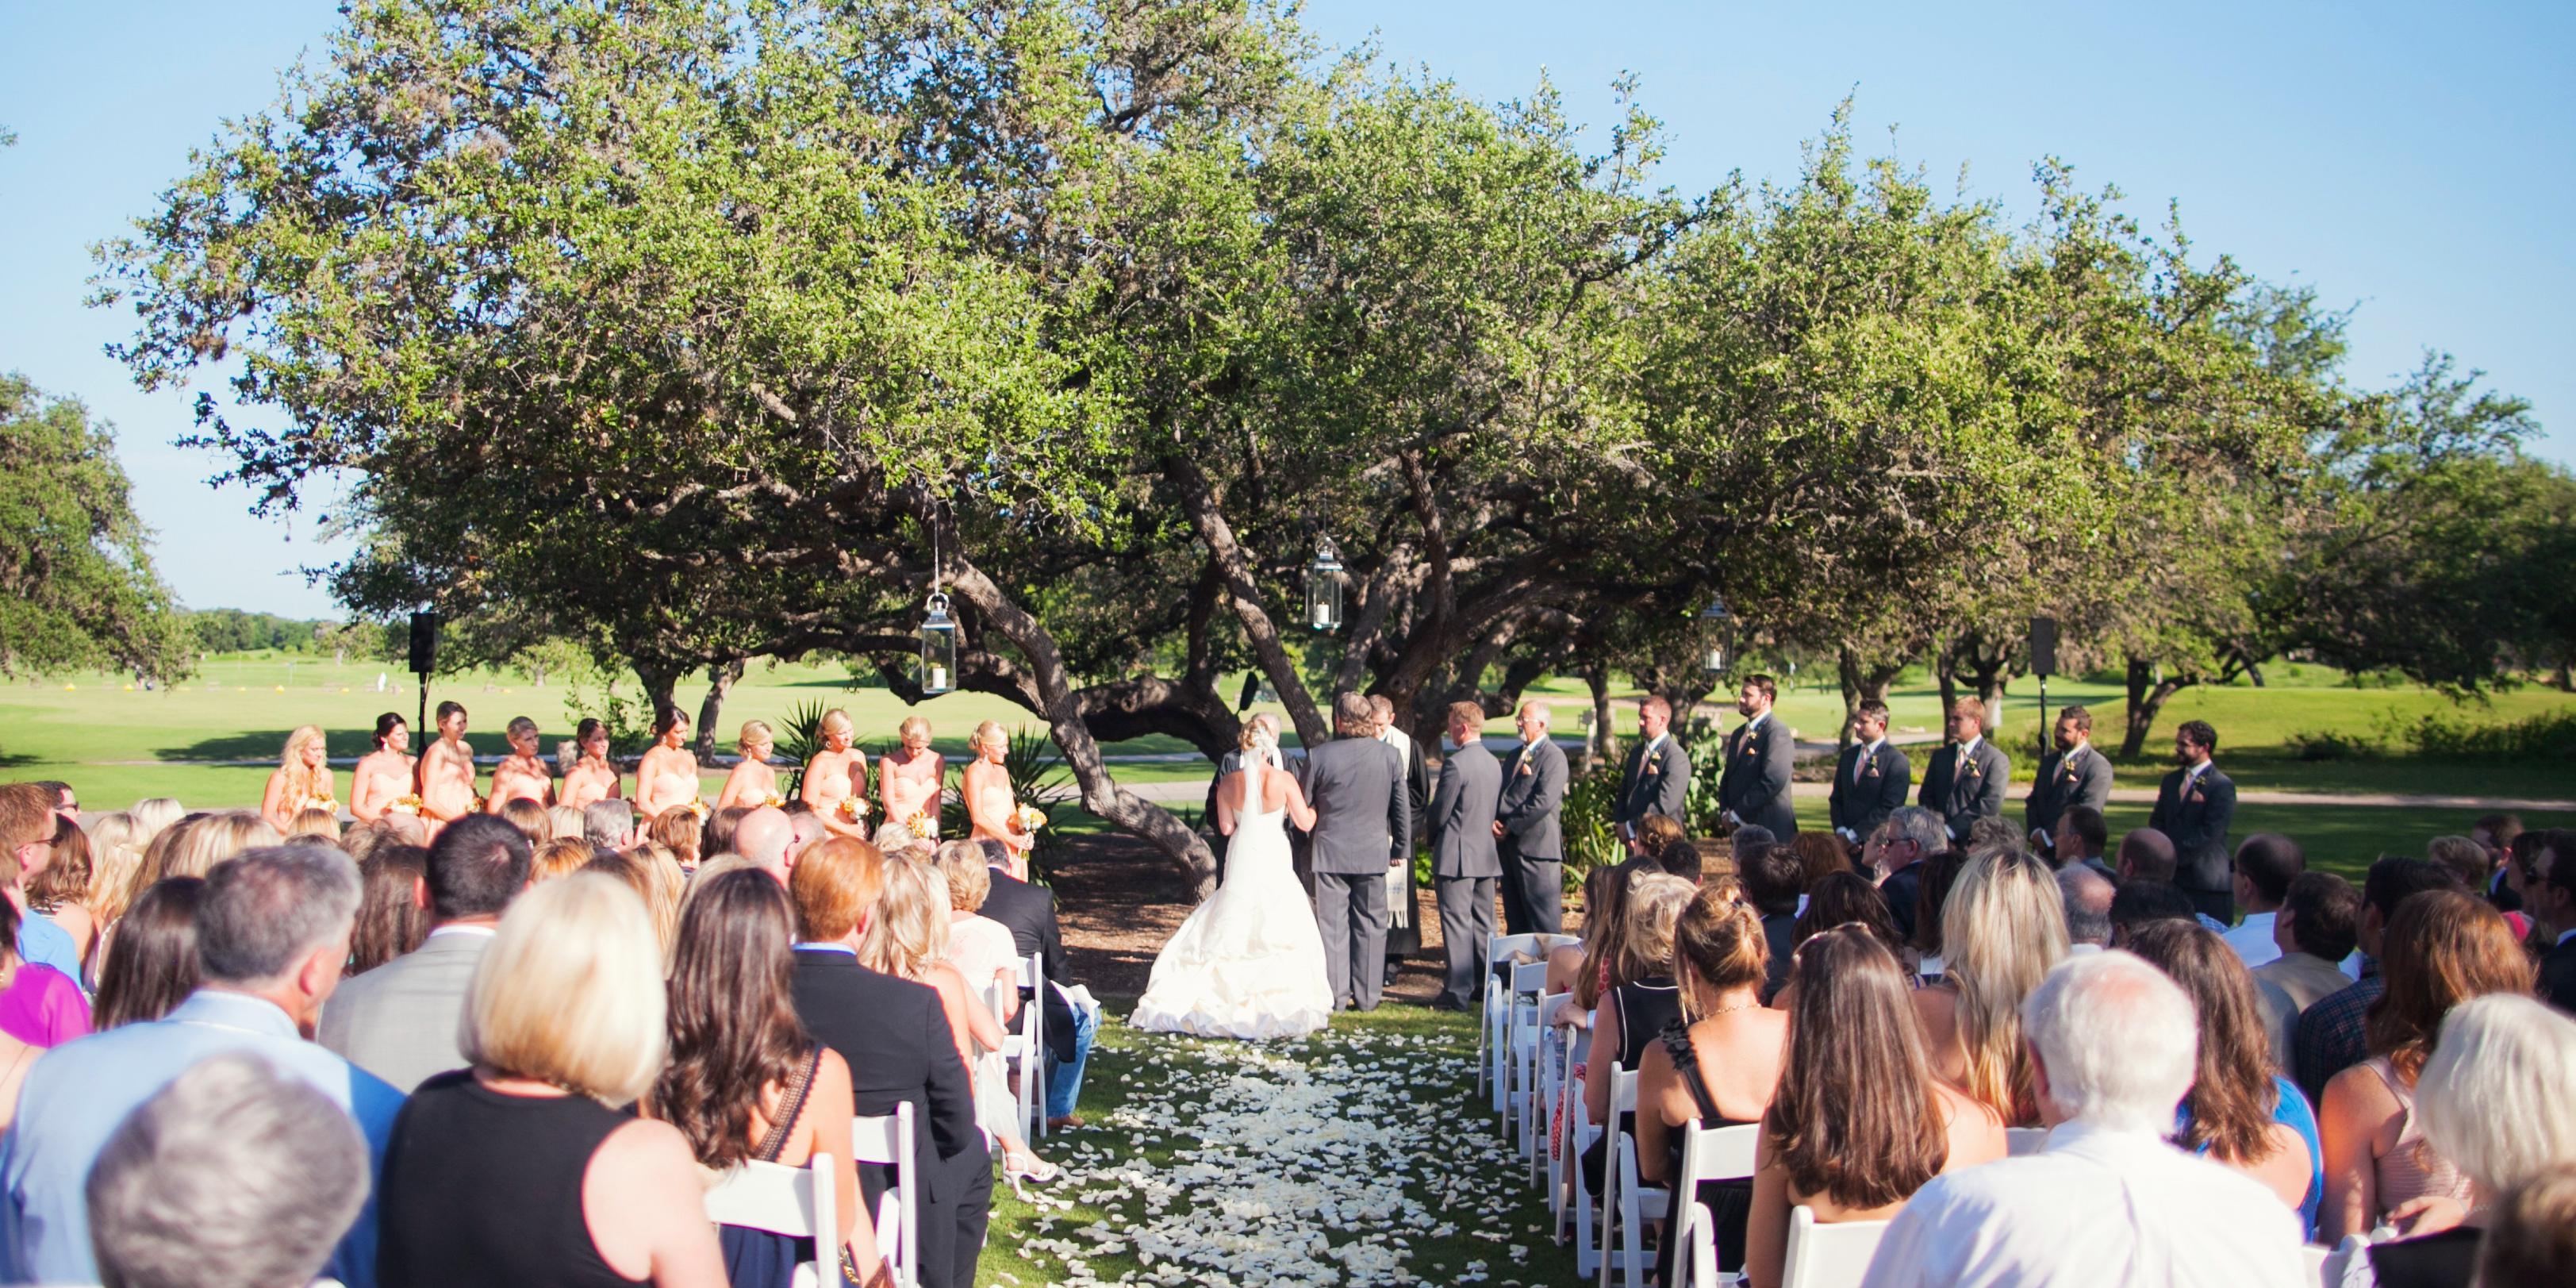 Hyatt Regency Hill Country Resort and Spa wedding San Antonio